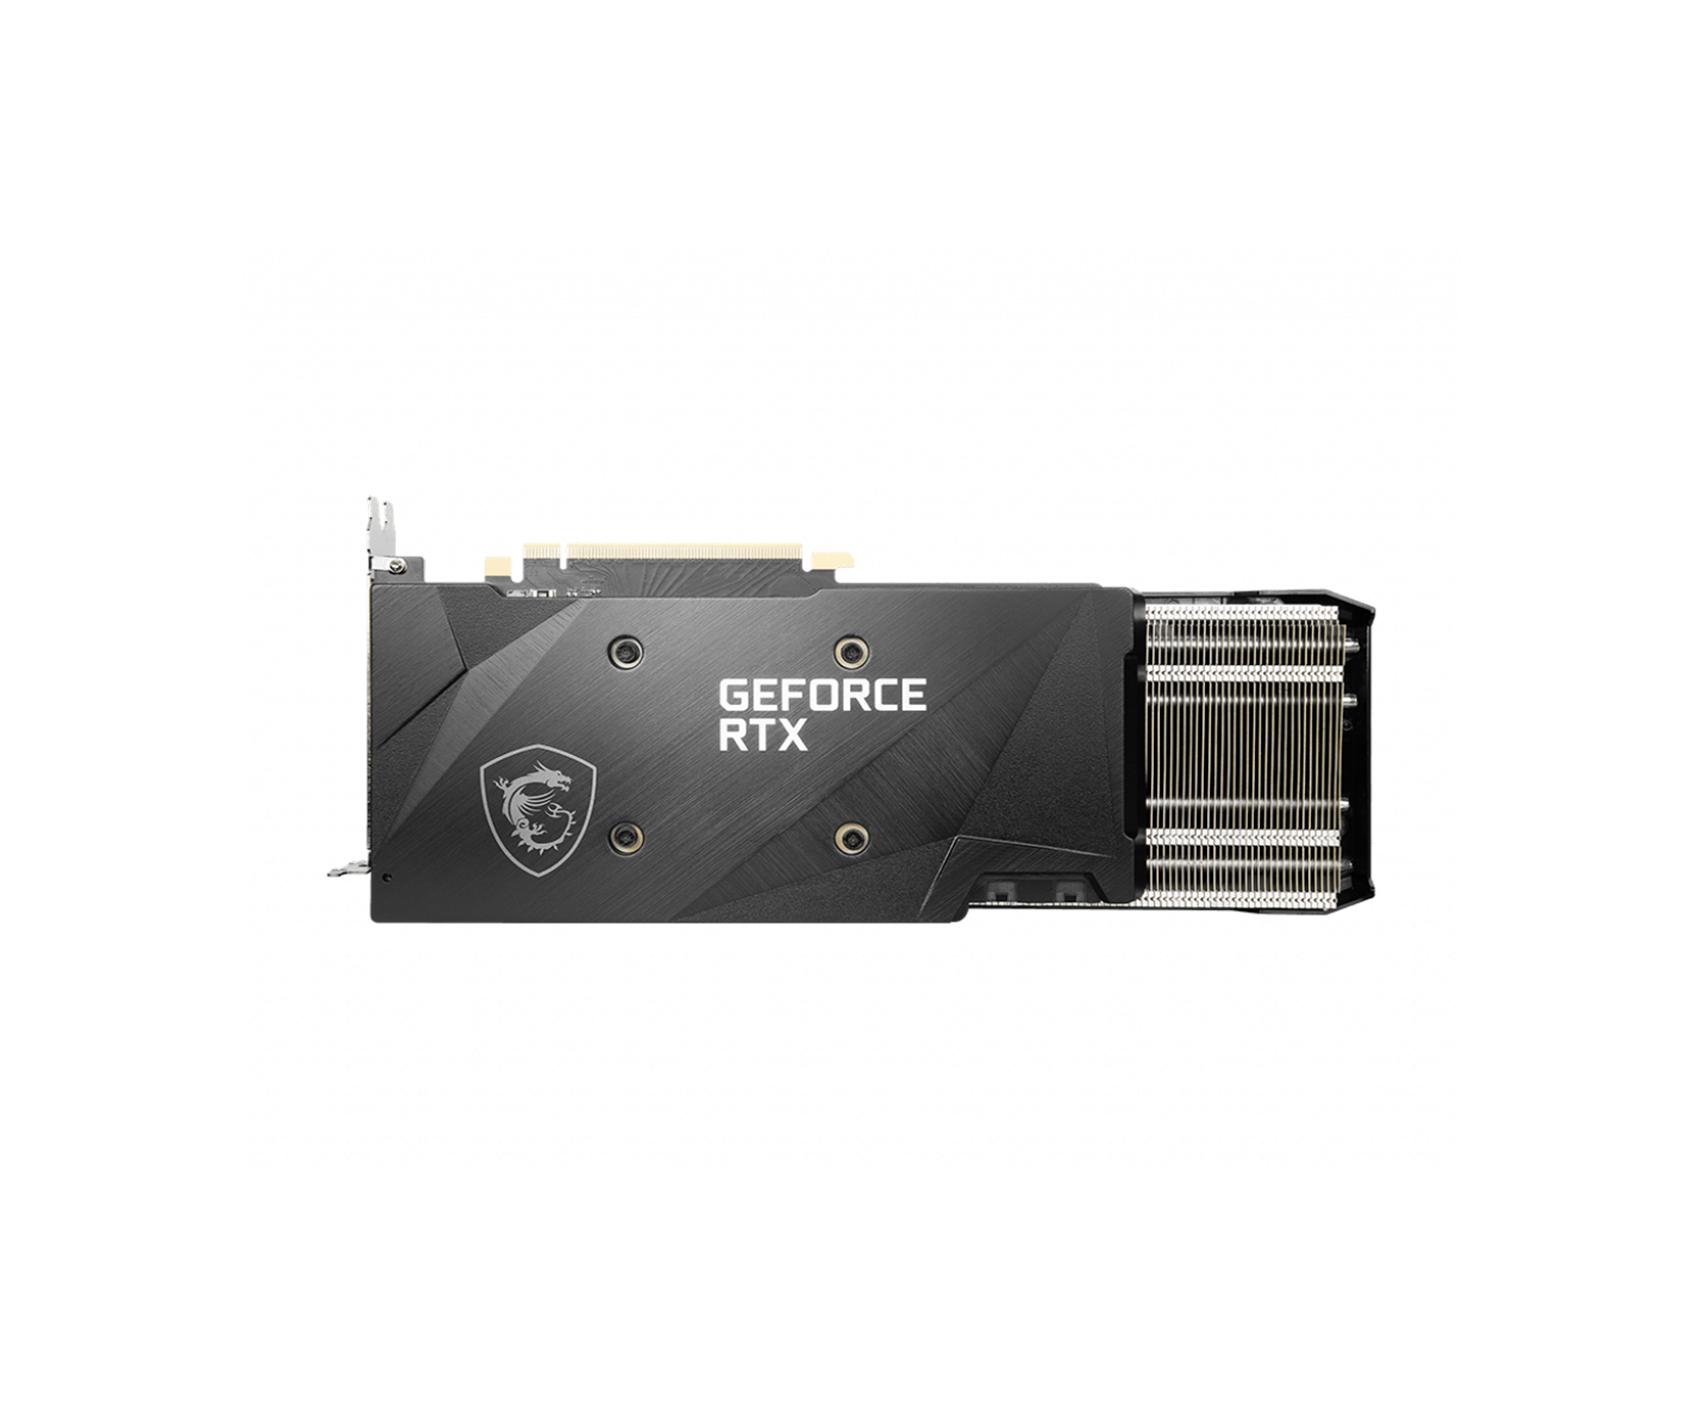 MSI GeForce RTX 3070 VENTUS 3X OC 8GB GDDR6 Graphic Card